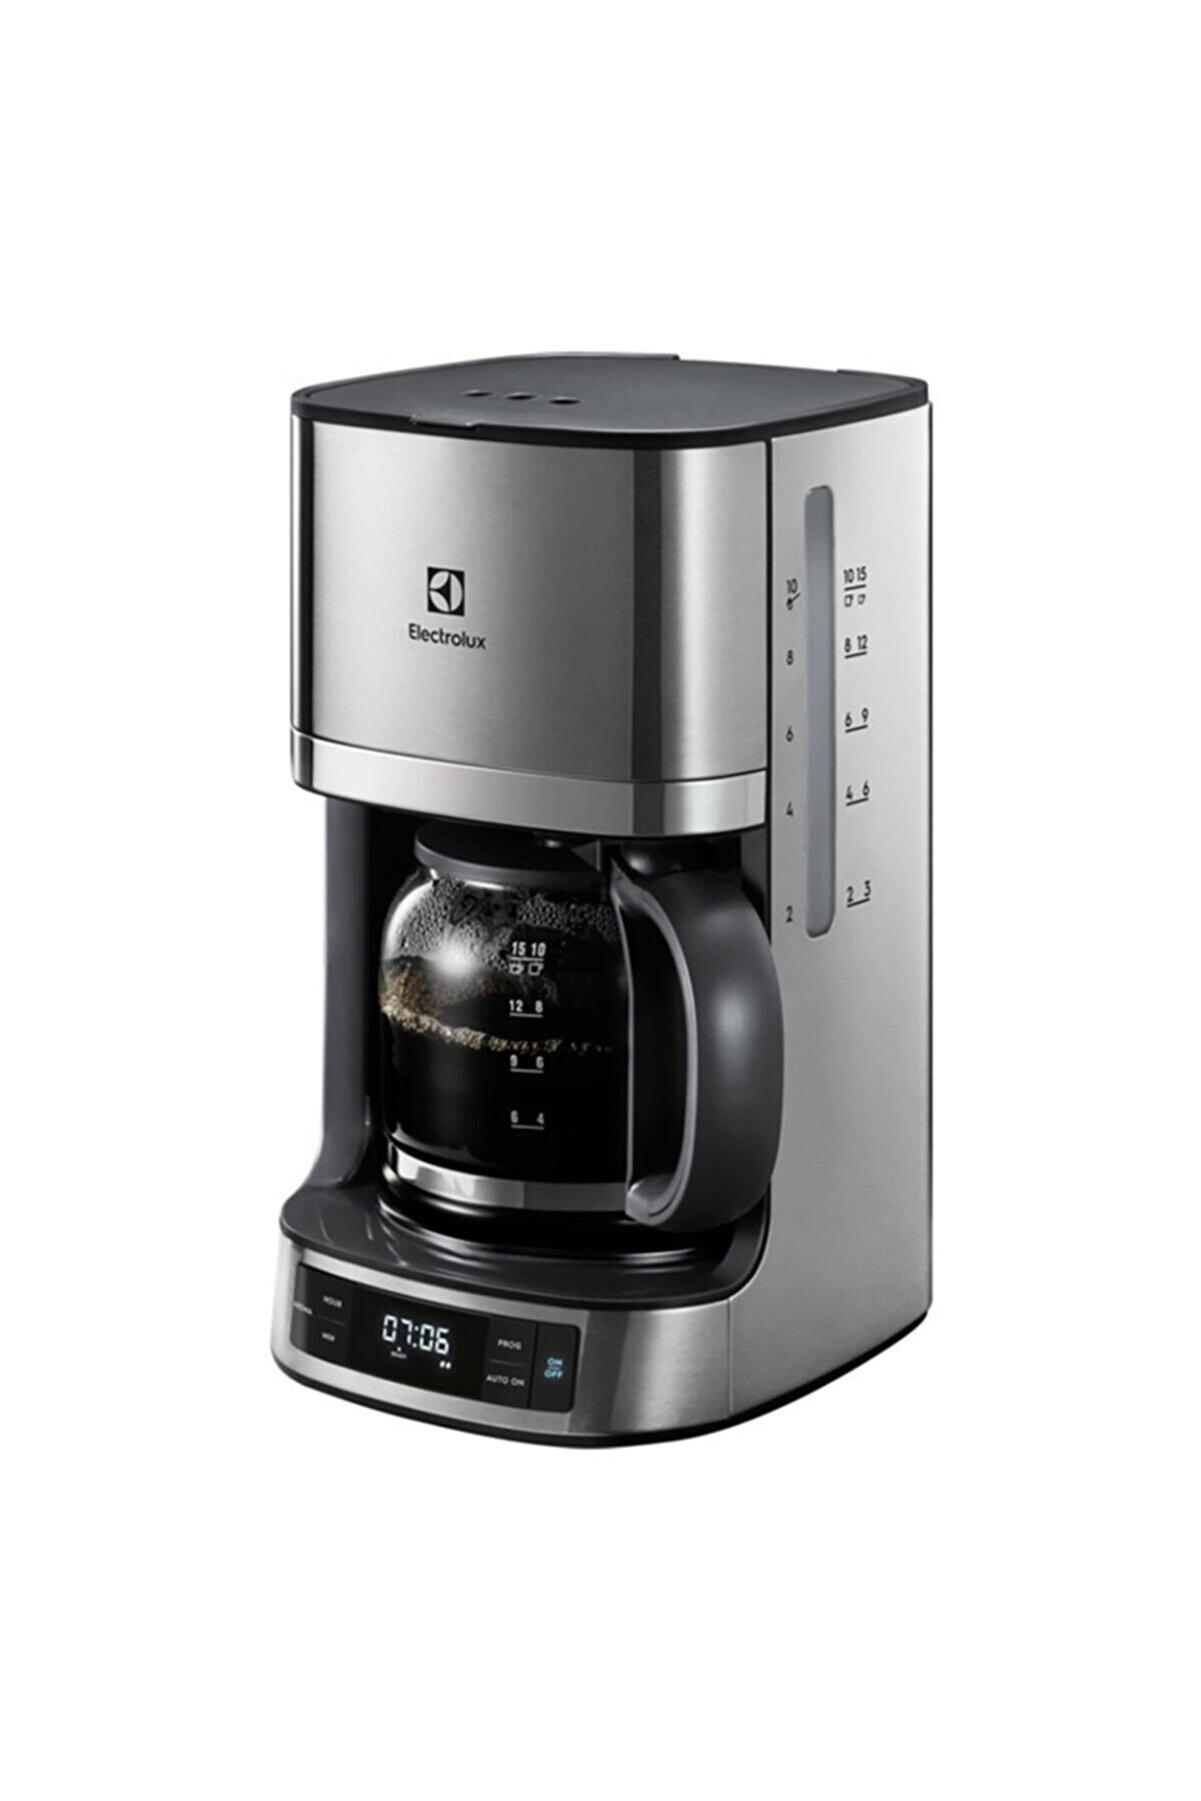 Electrolux Ekf7700 1080w Aroma Ve Zaman Ayarlı Filtre Kahve Makinesi